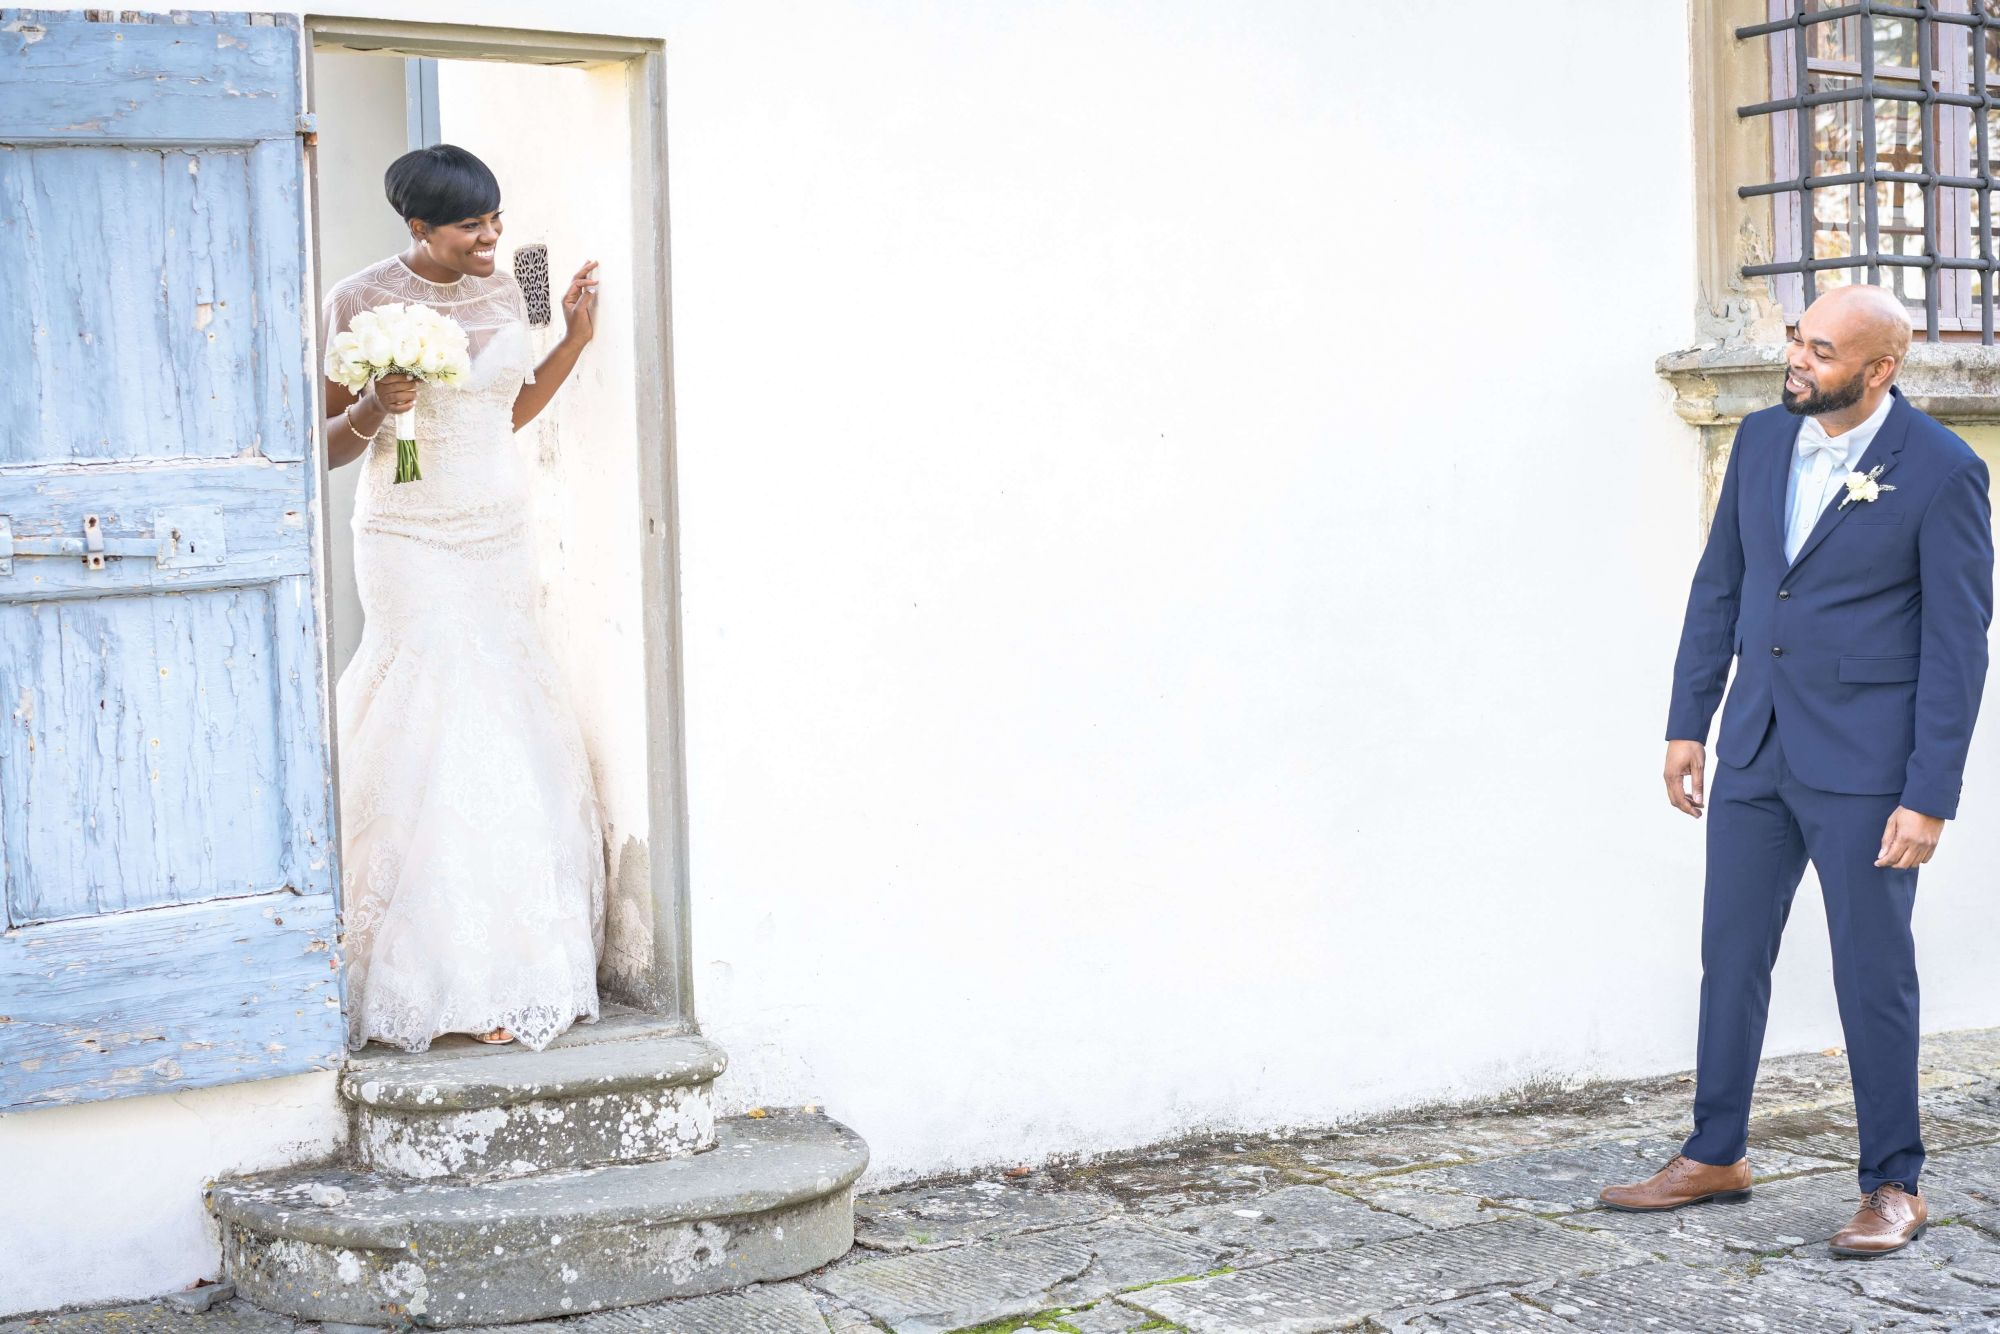 matrimonio P&J - Villa Corsini a Mezzomonte - Toscana